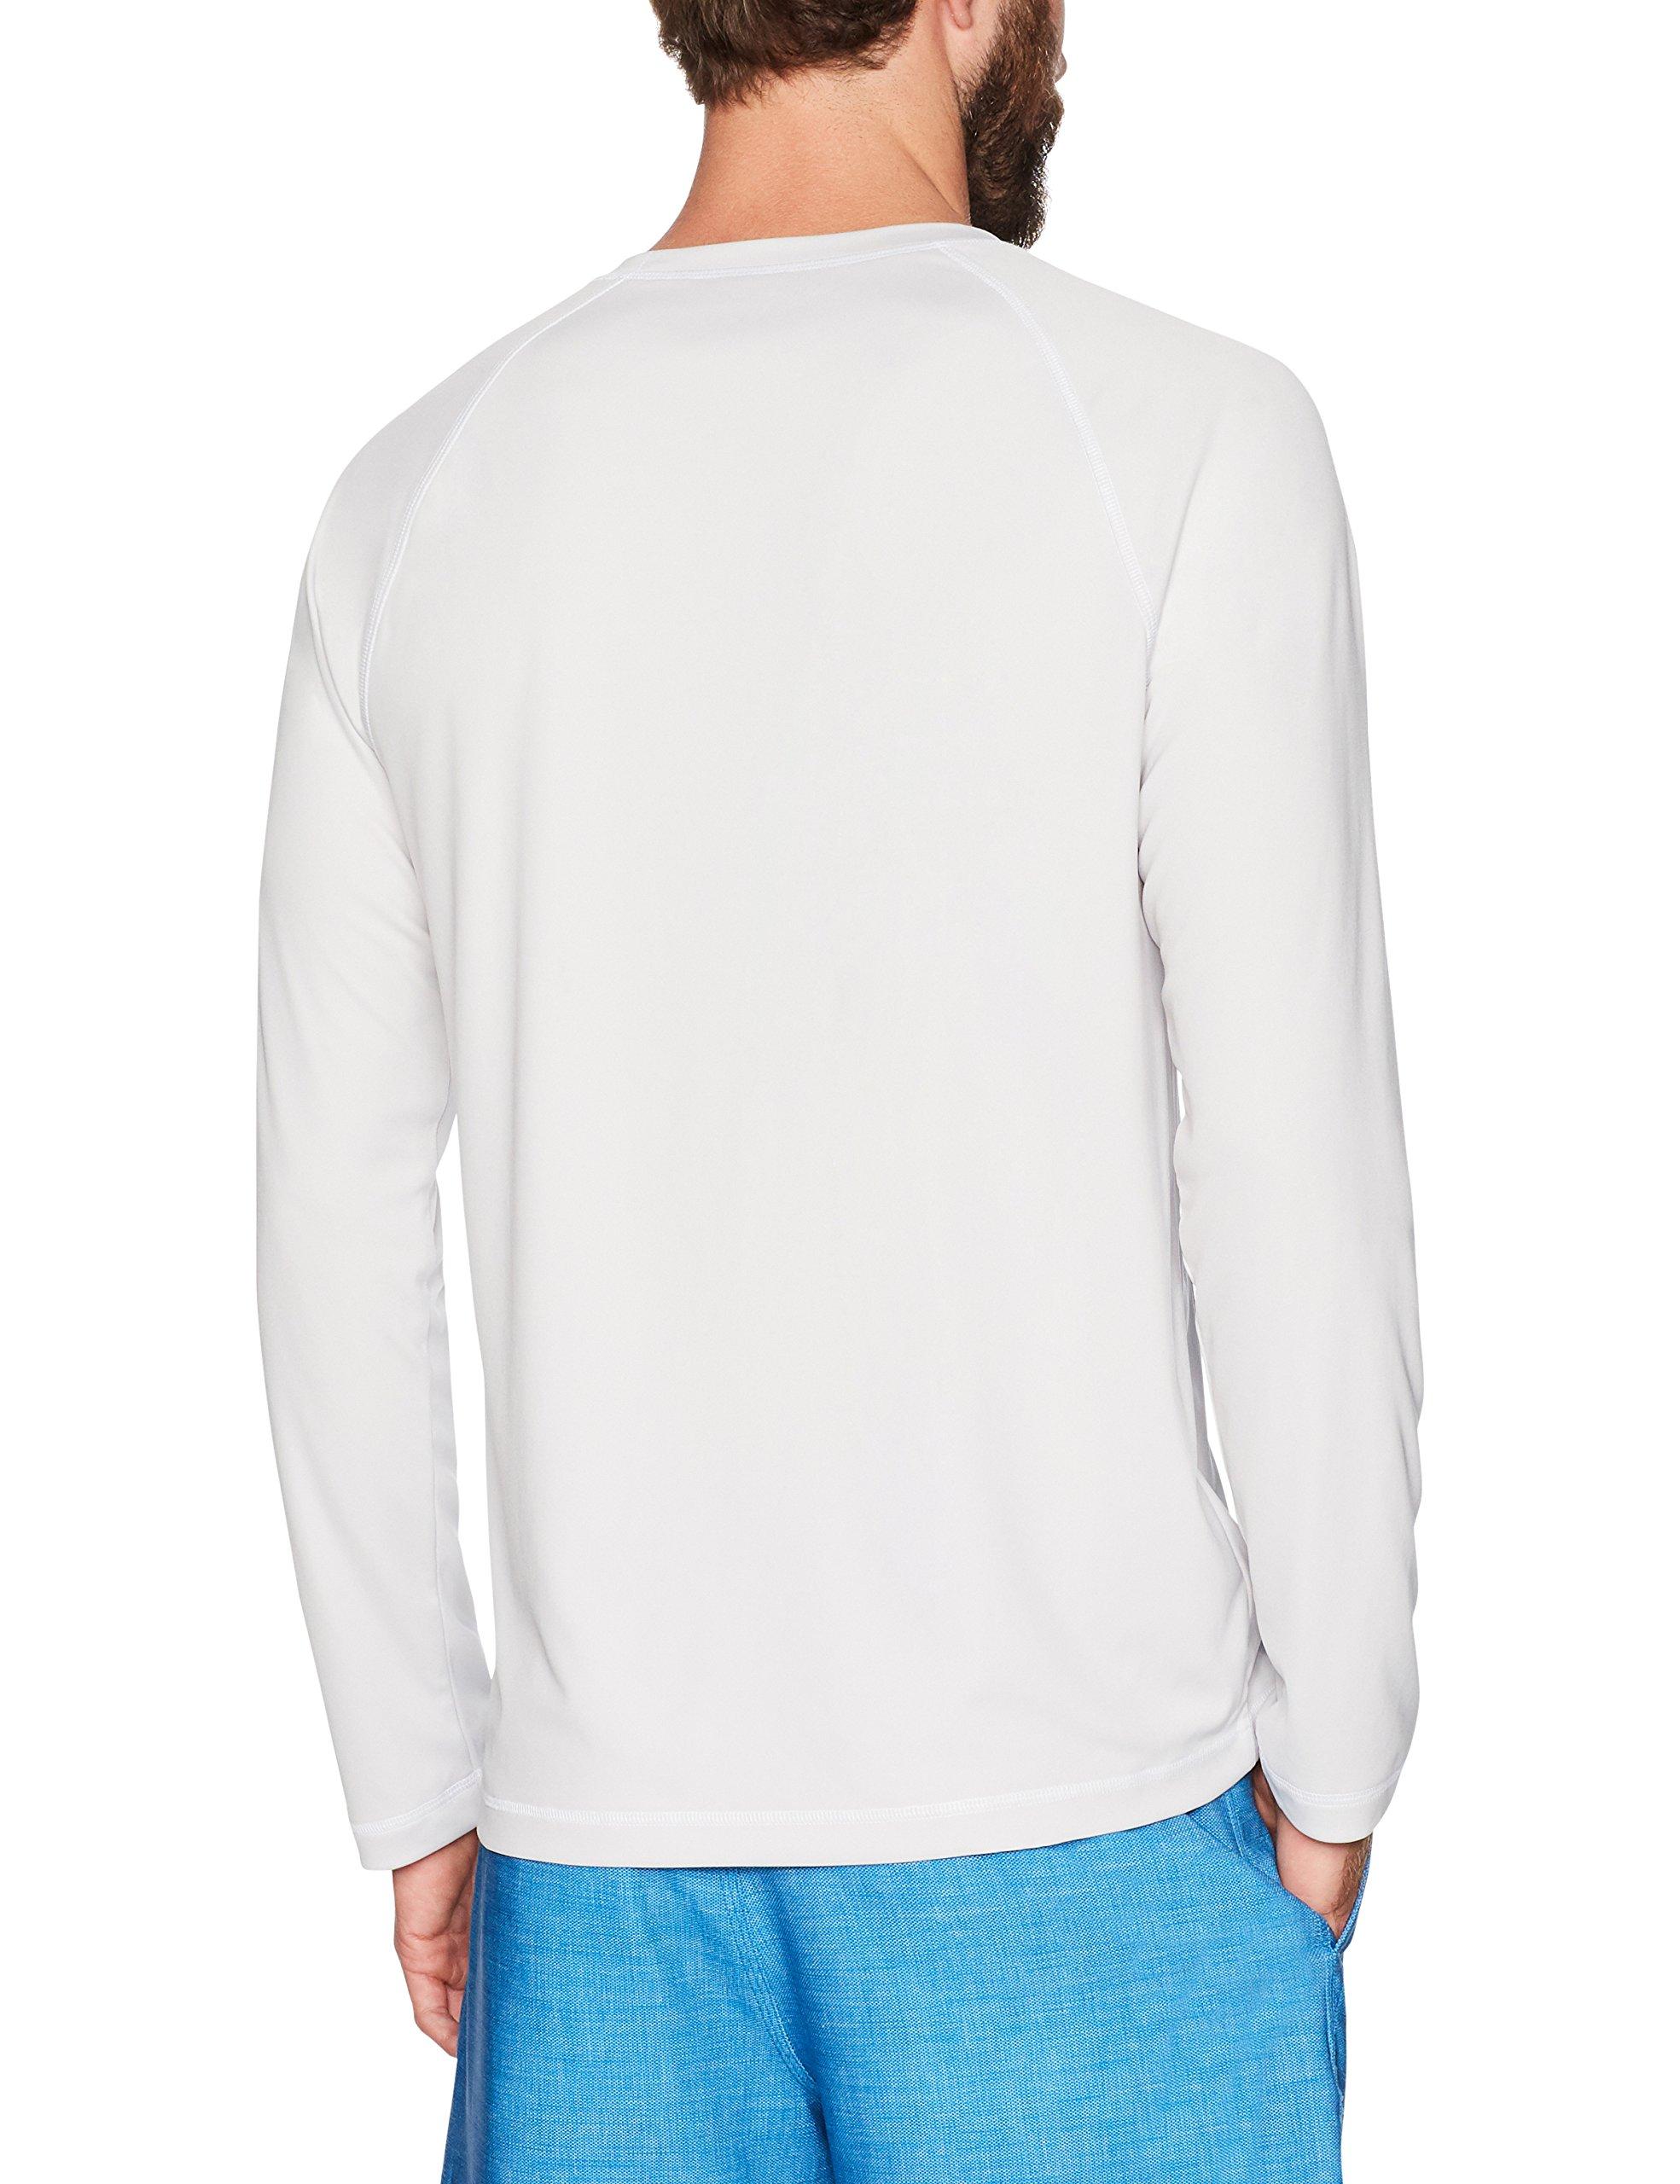 Amazon Essentials Men's Long-Sleeve Quick-Dry UPF 50 Swim Tee, Silver, Medium by Amazon Essentials (Image #4)